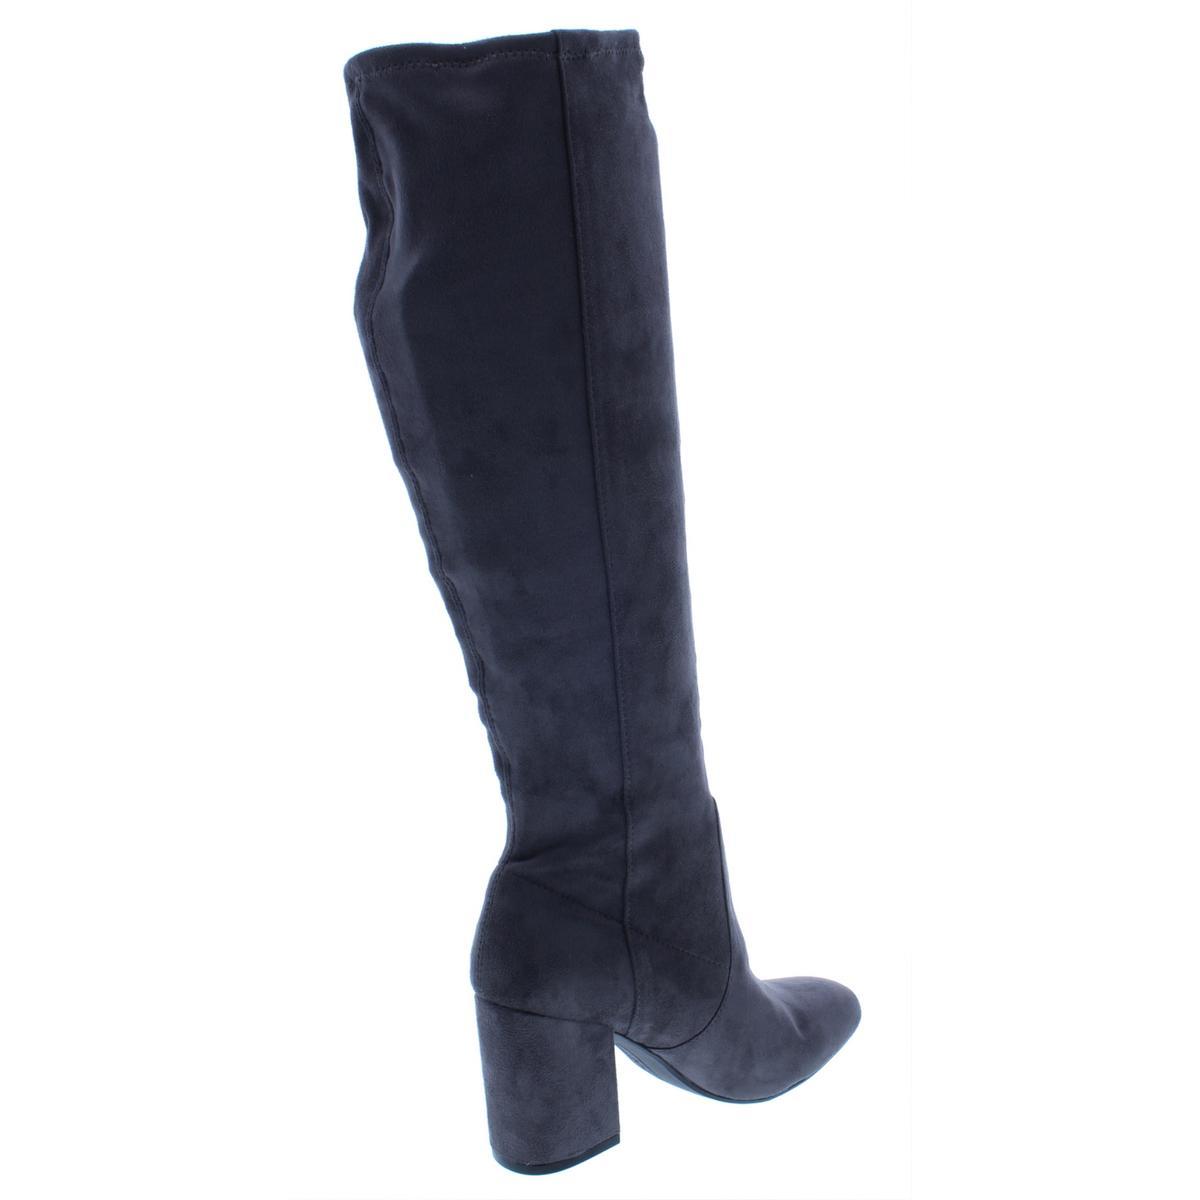 Seven-Dials-Womens-Britney-Solid-Square-Toe-Dress-Boots-Heels-BHFO-6188 miniatura 6